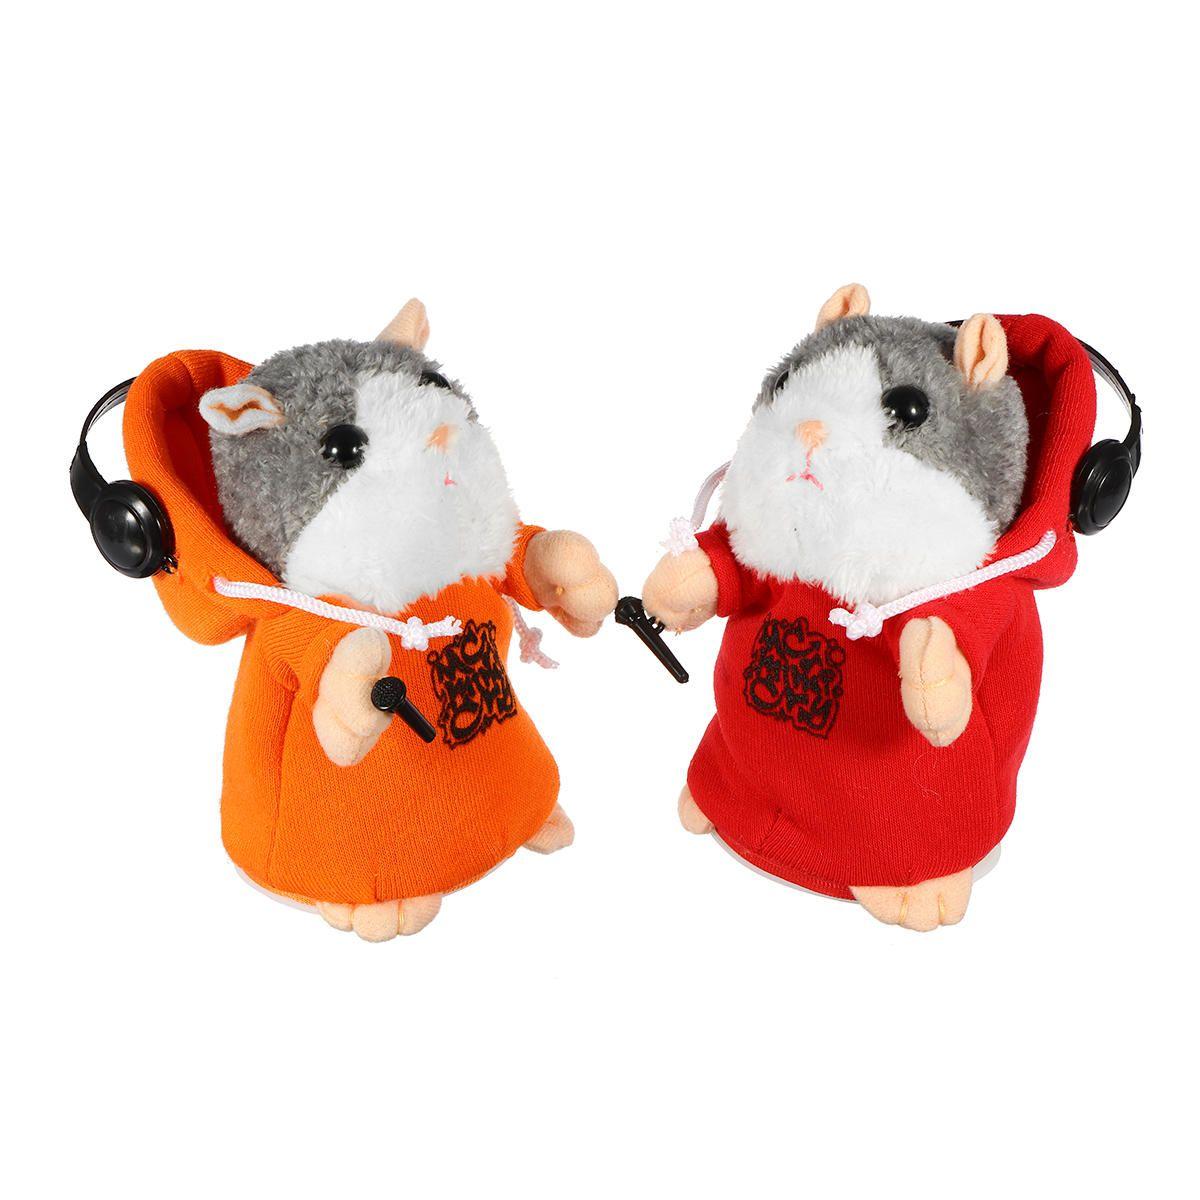 Cute Speak Talking Plush Hamster Mimic Repeat Recording Electric